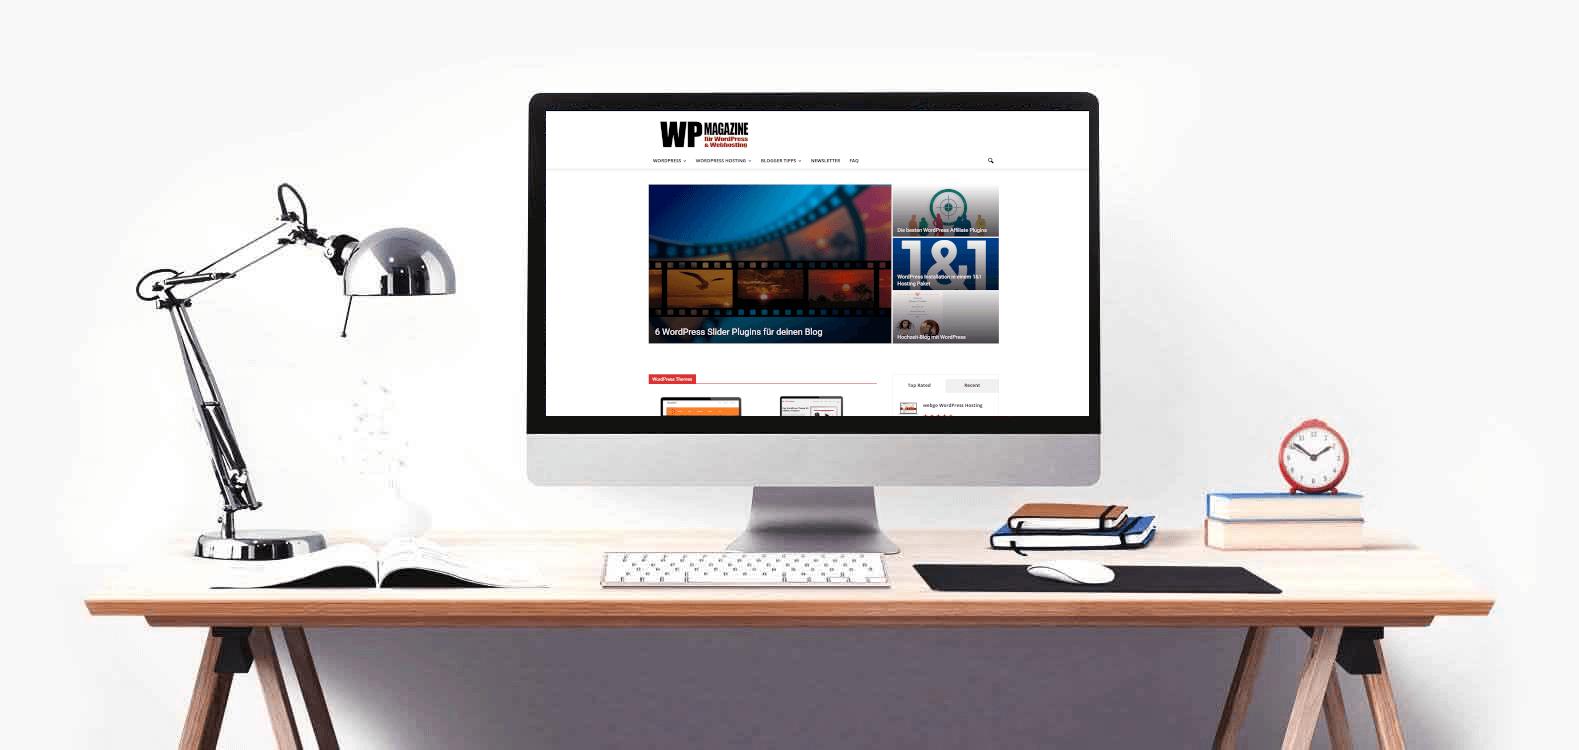 WP-Magazine - WordPress - WordPress-Hosting Blog-Marketing